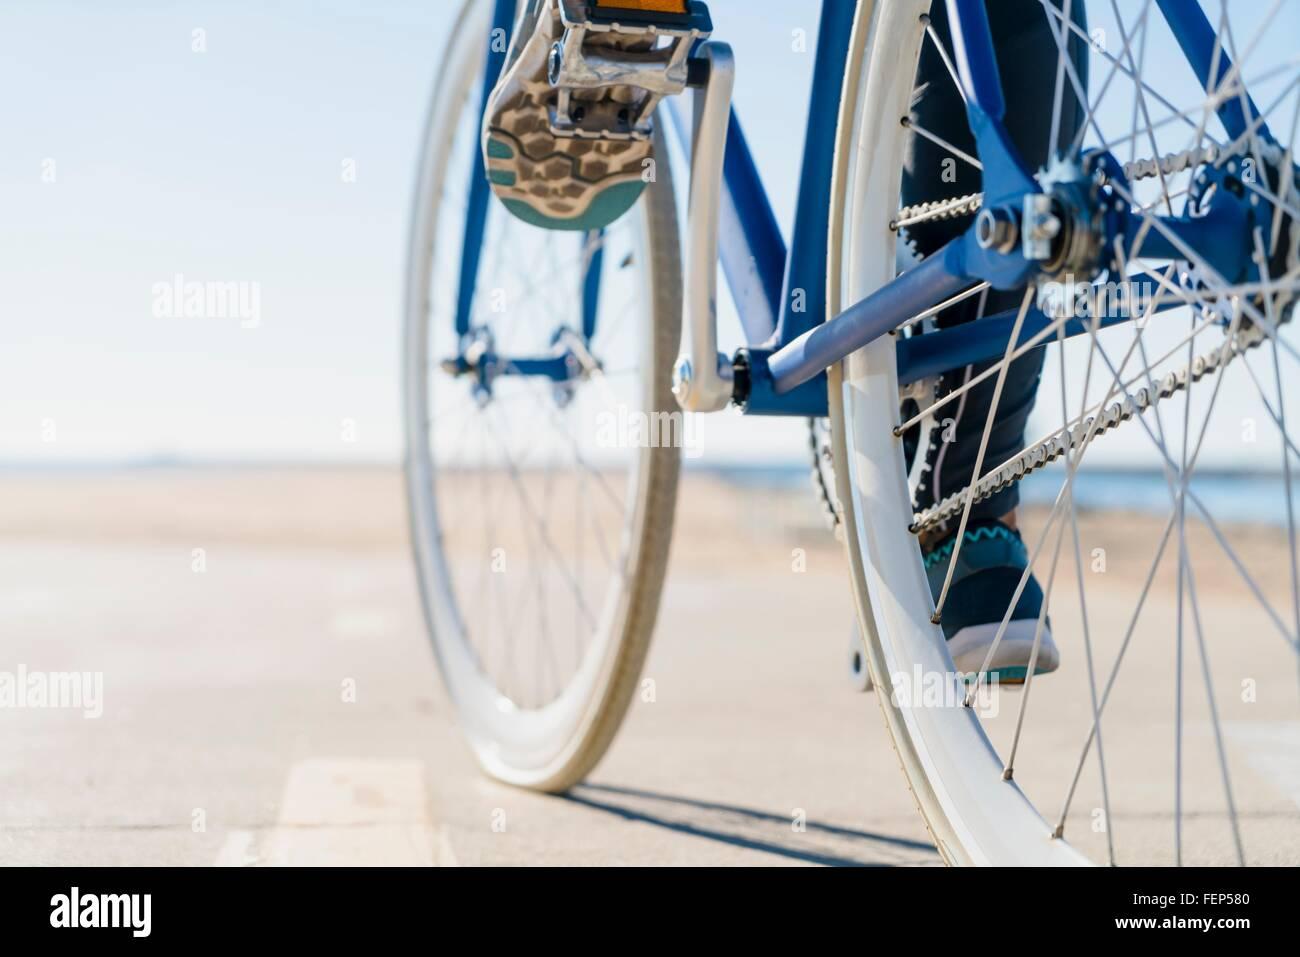 Vélo femme, faible section, close-up Photo Stock